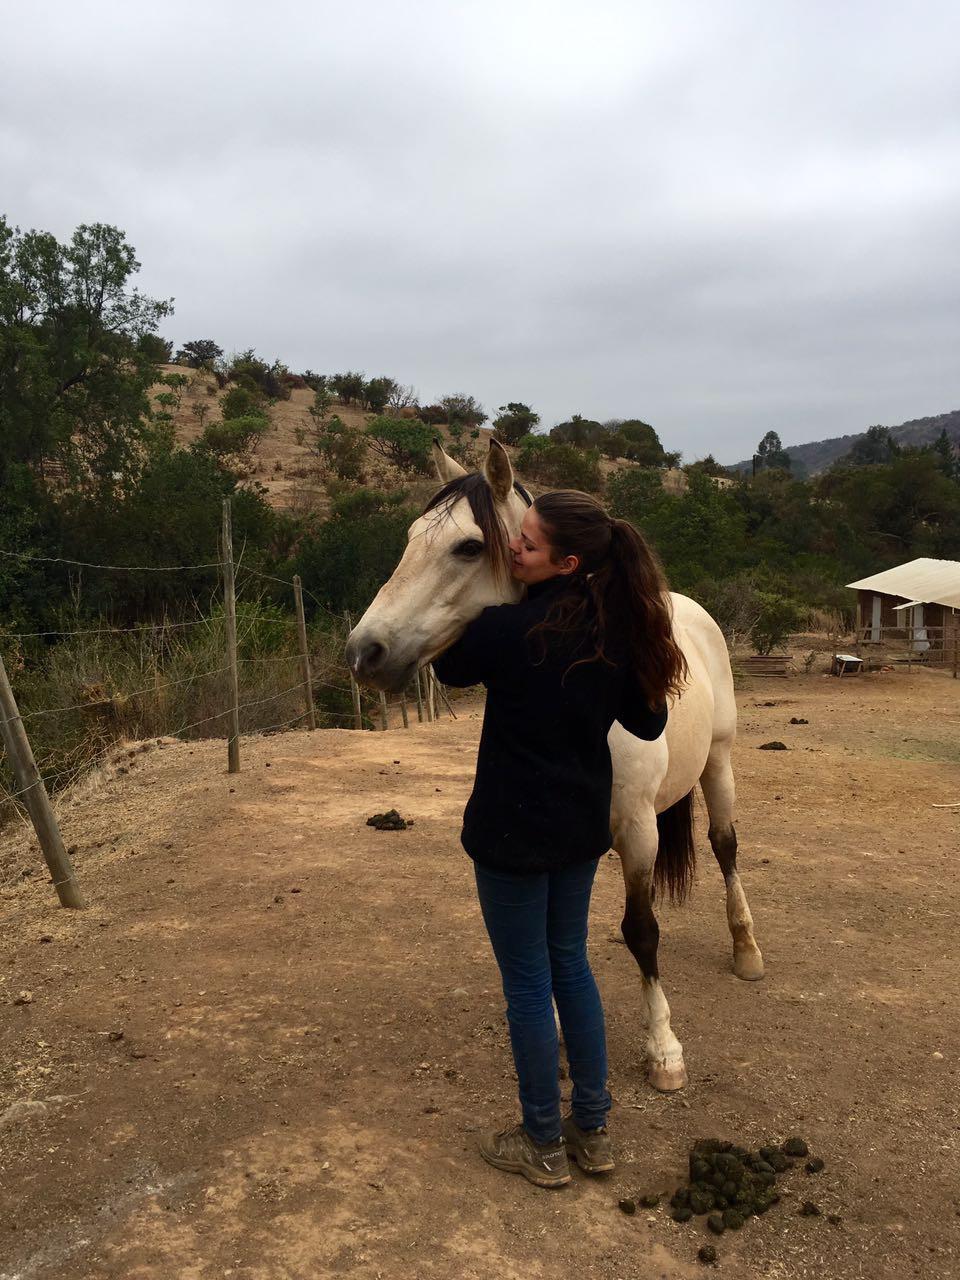 volunteer workntravel horse ranch chile